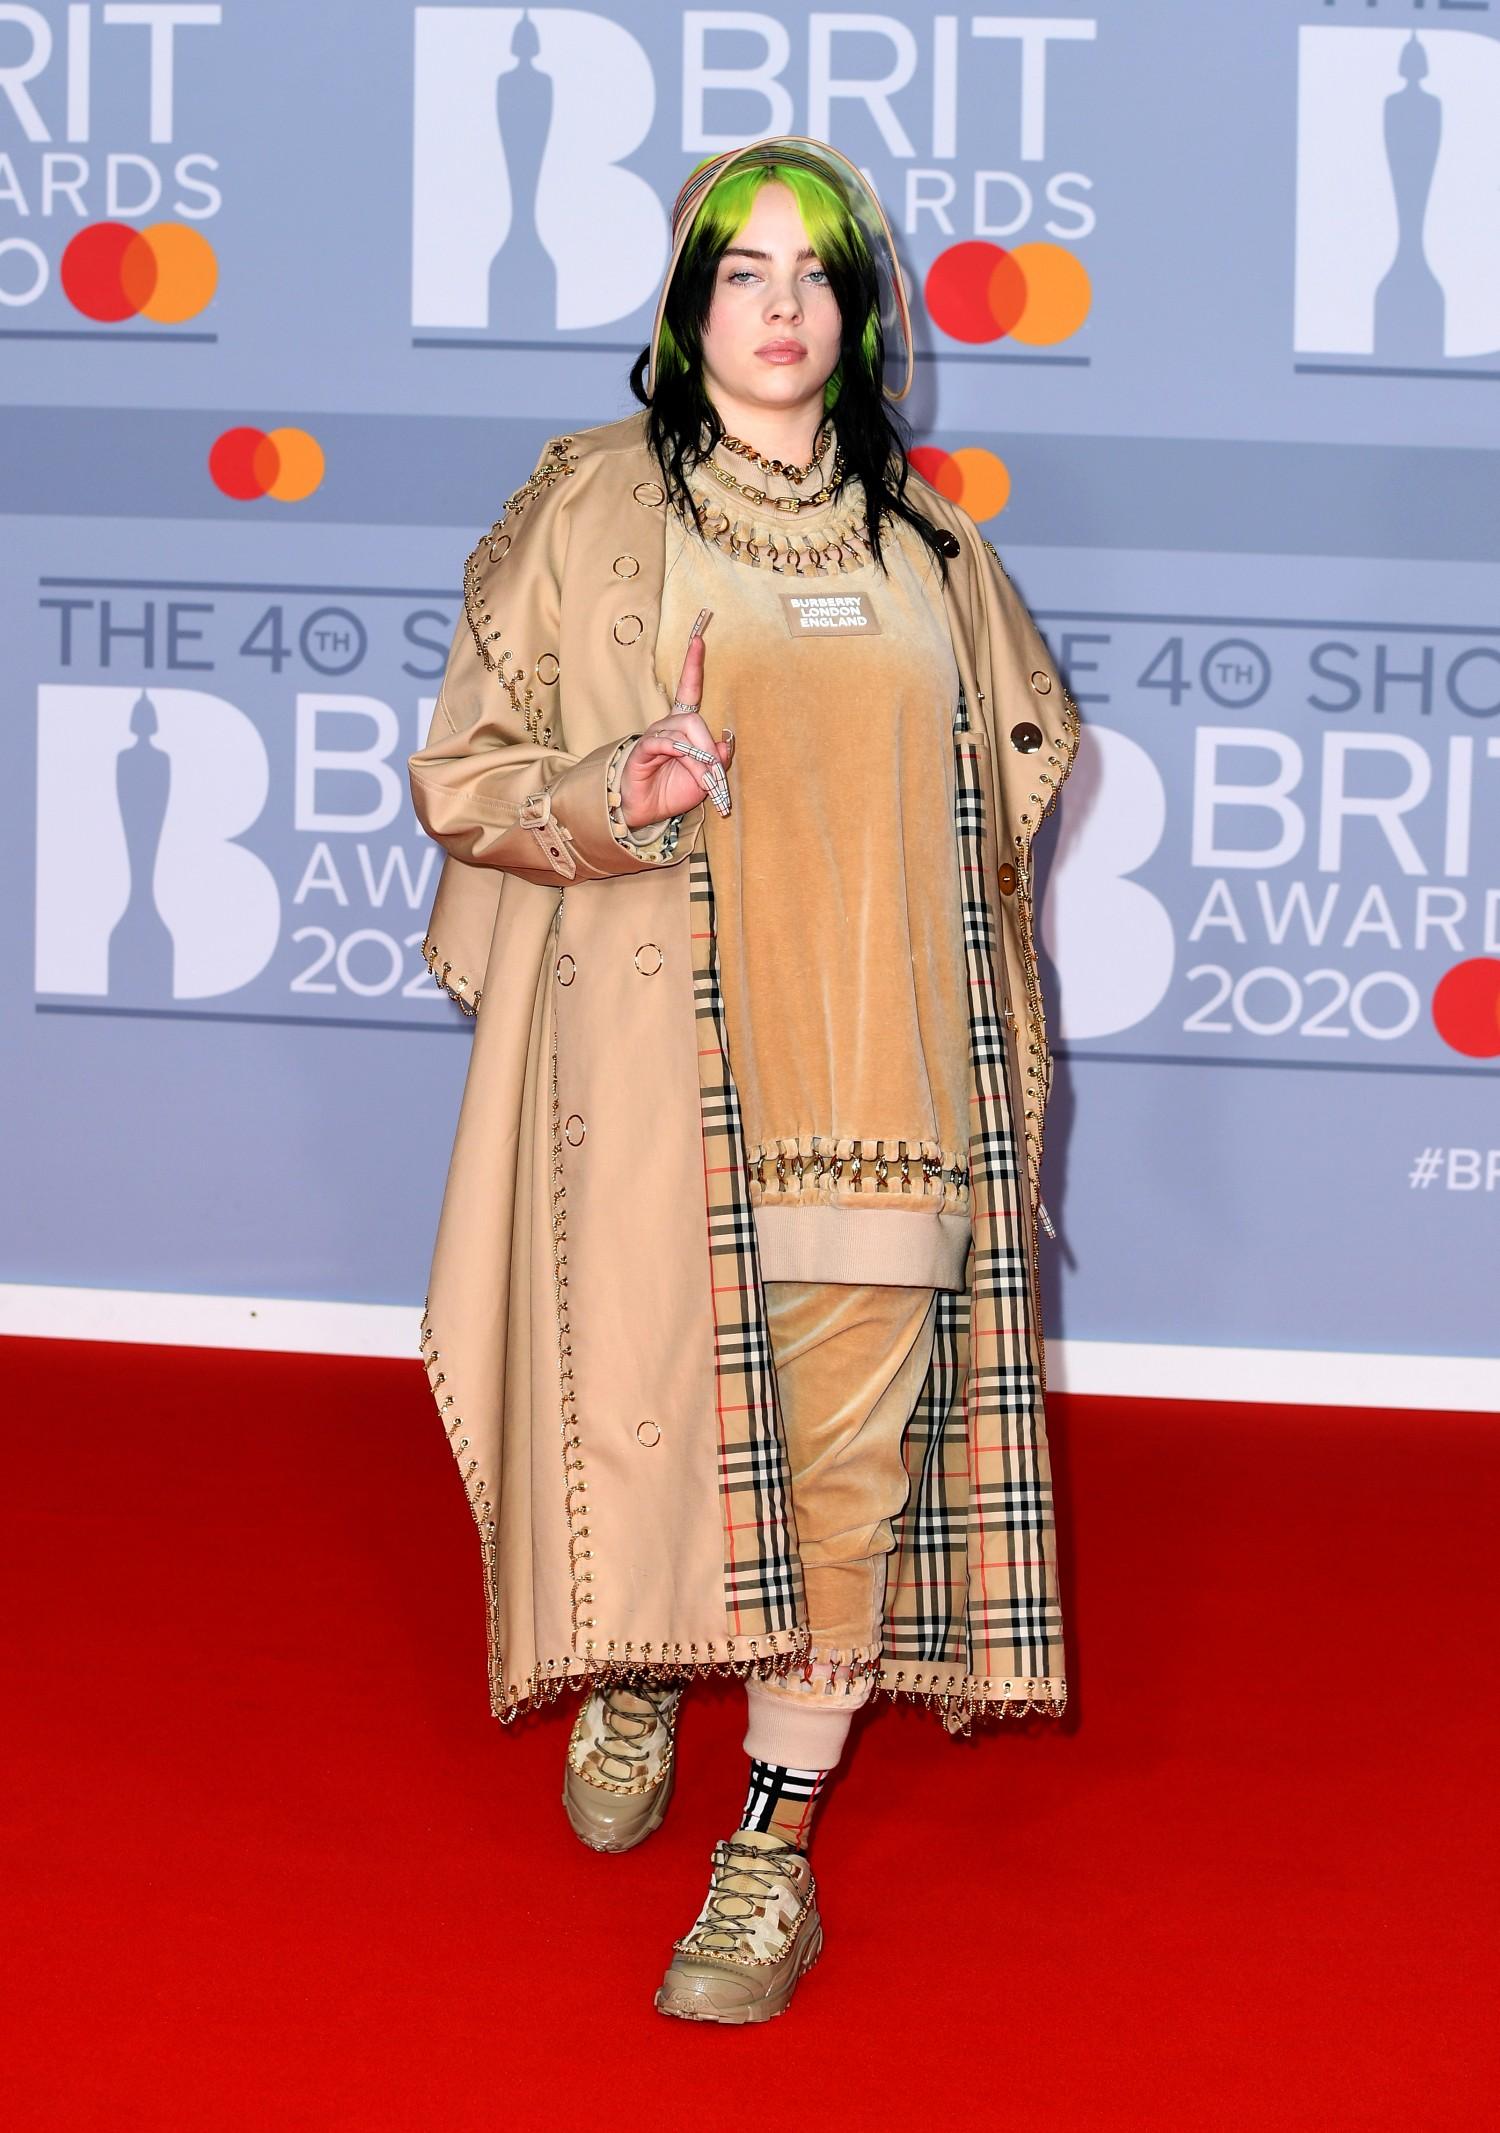 Brit Awards 2020